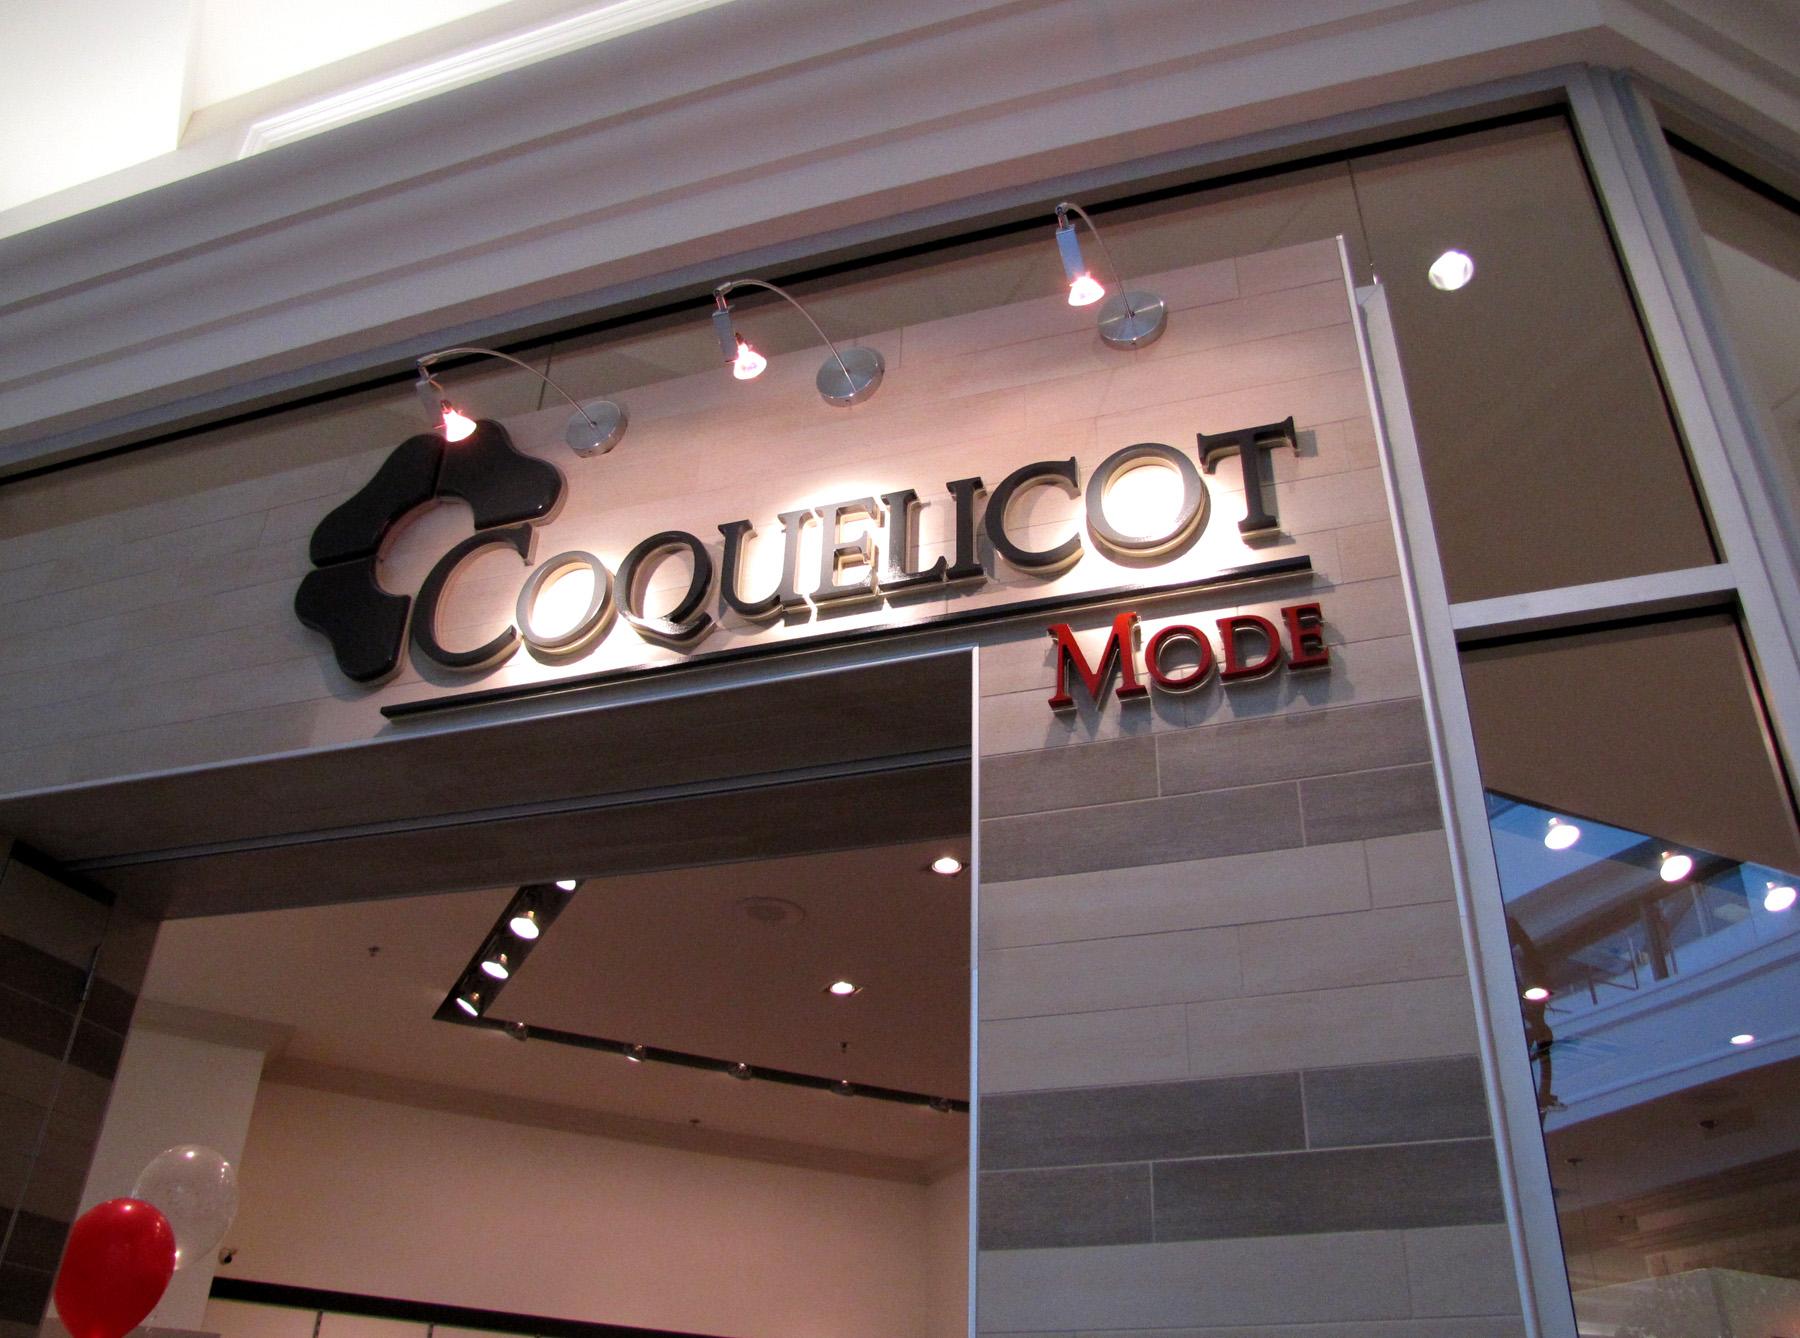 Coquelicot Mode